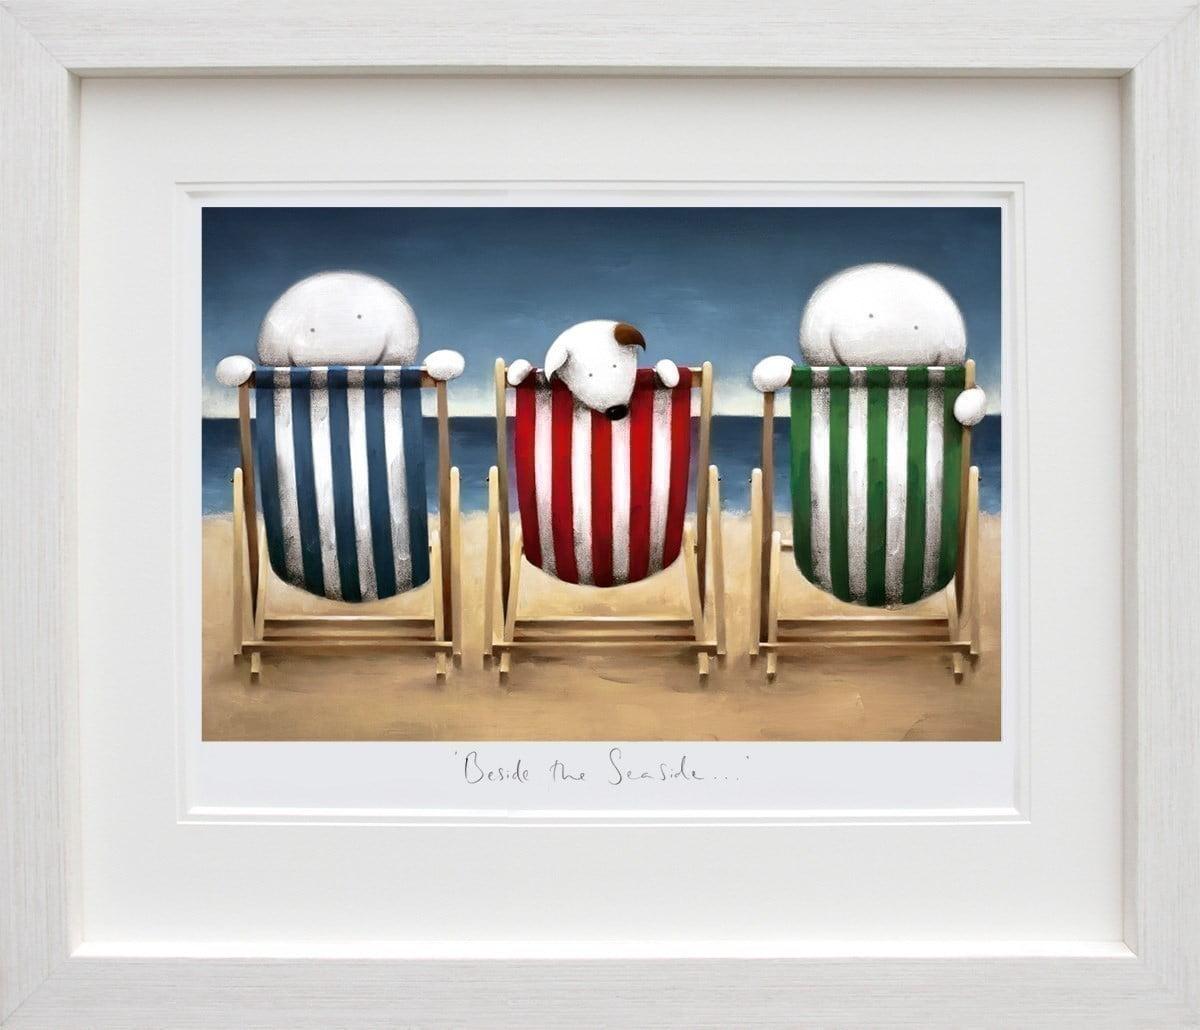 Beside the Seaside ~ Doug Hyde